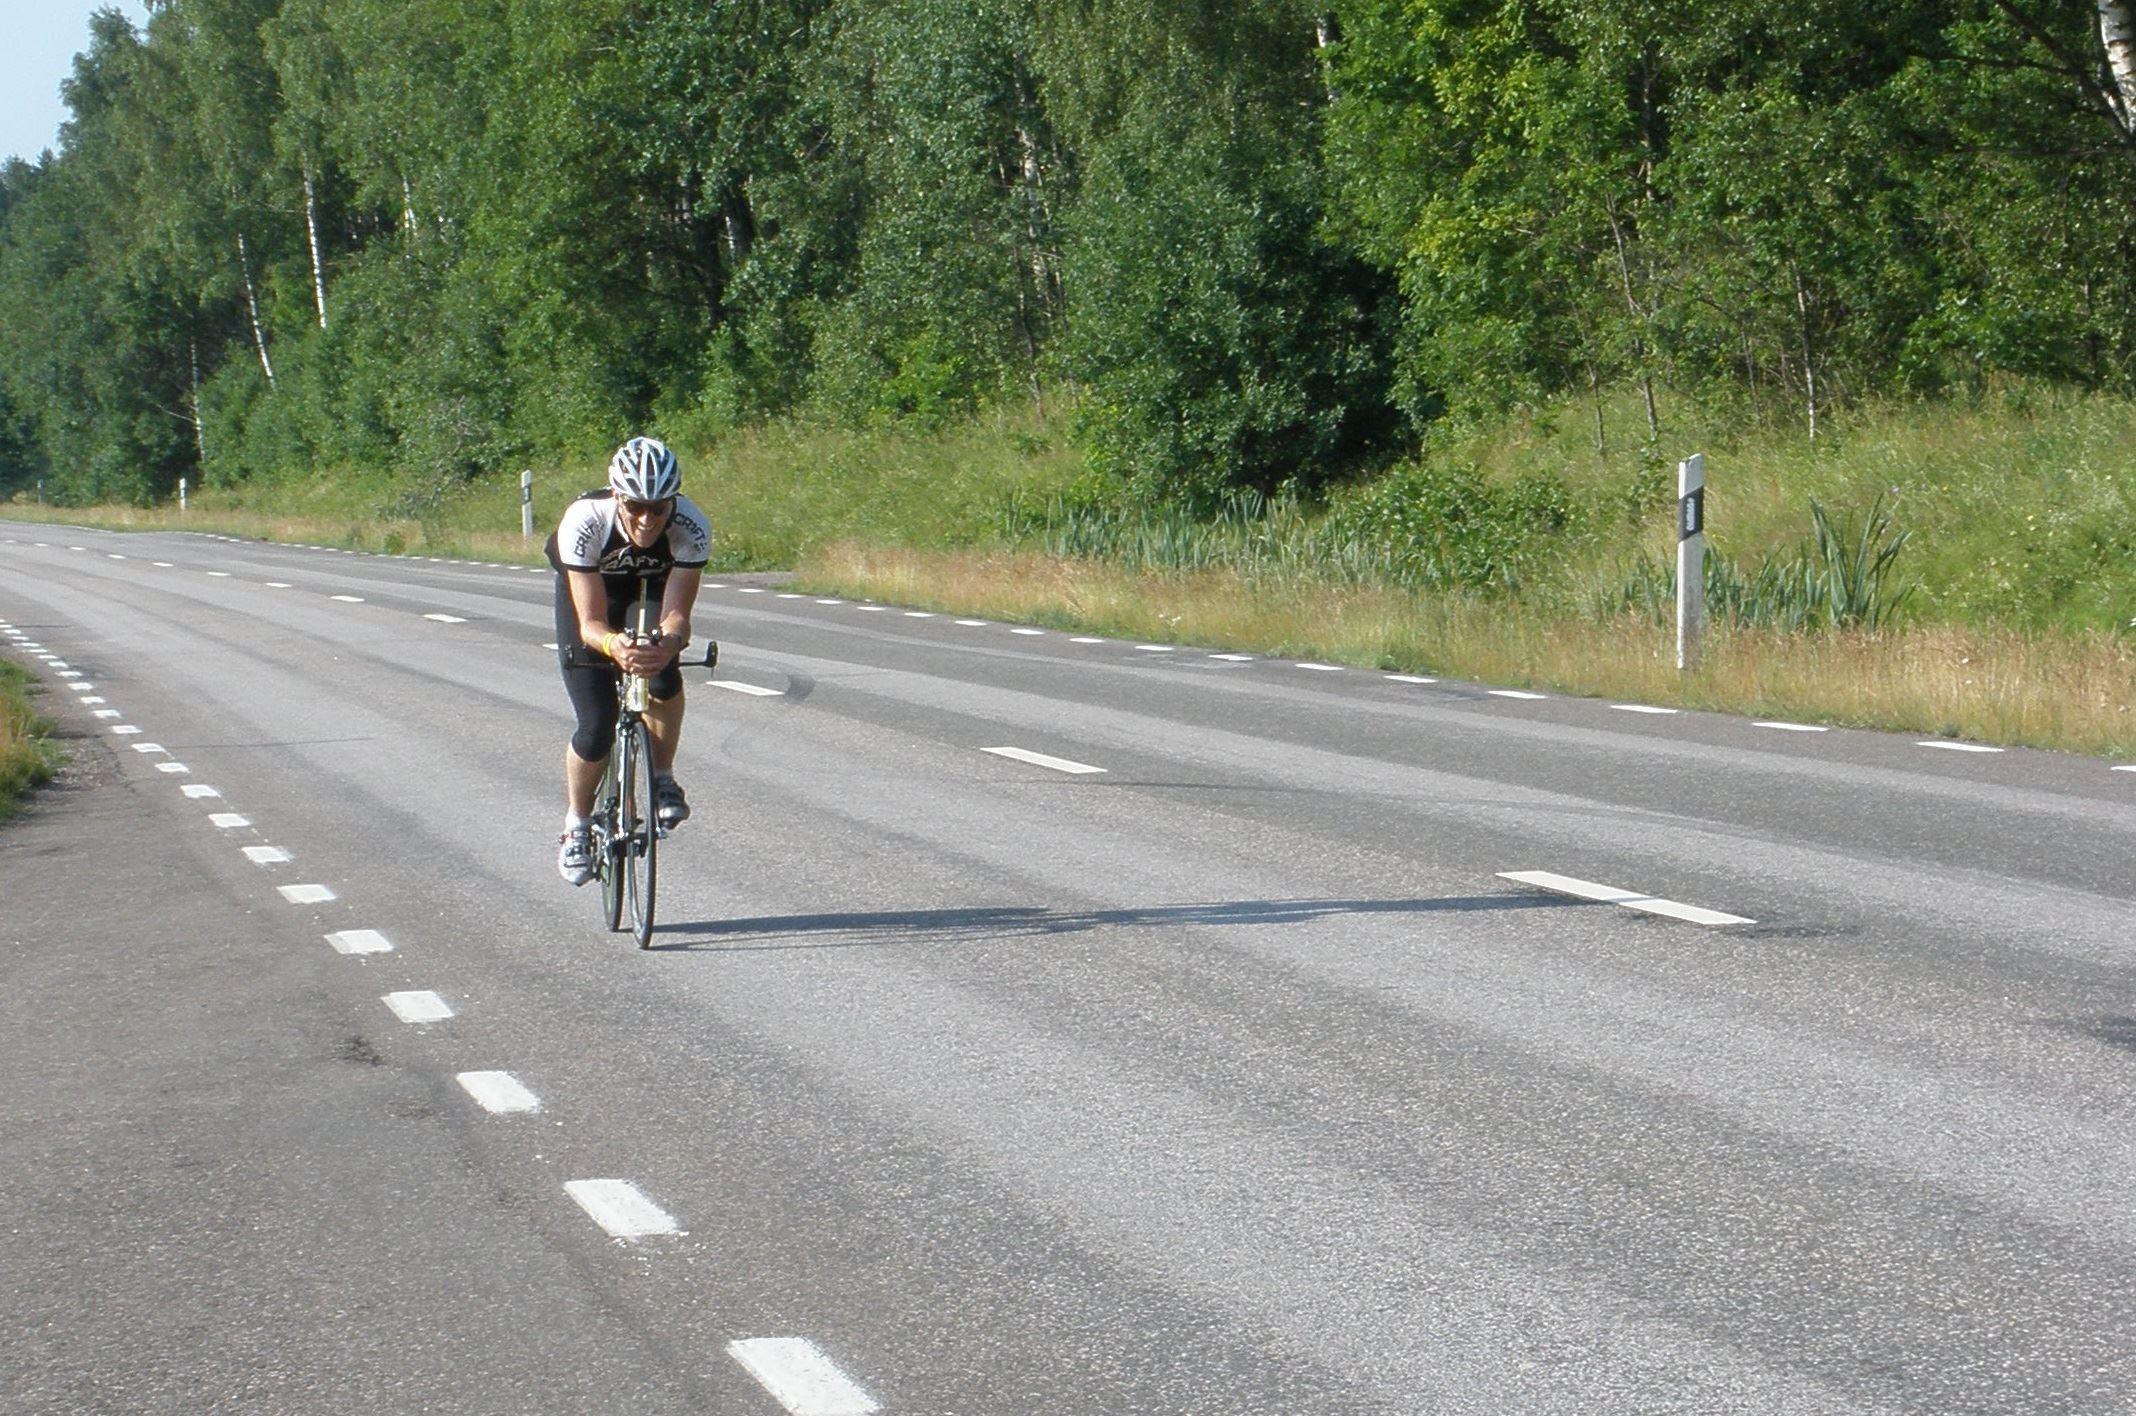 Biking: Sirkön tur och retur, 76 km